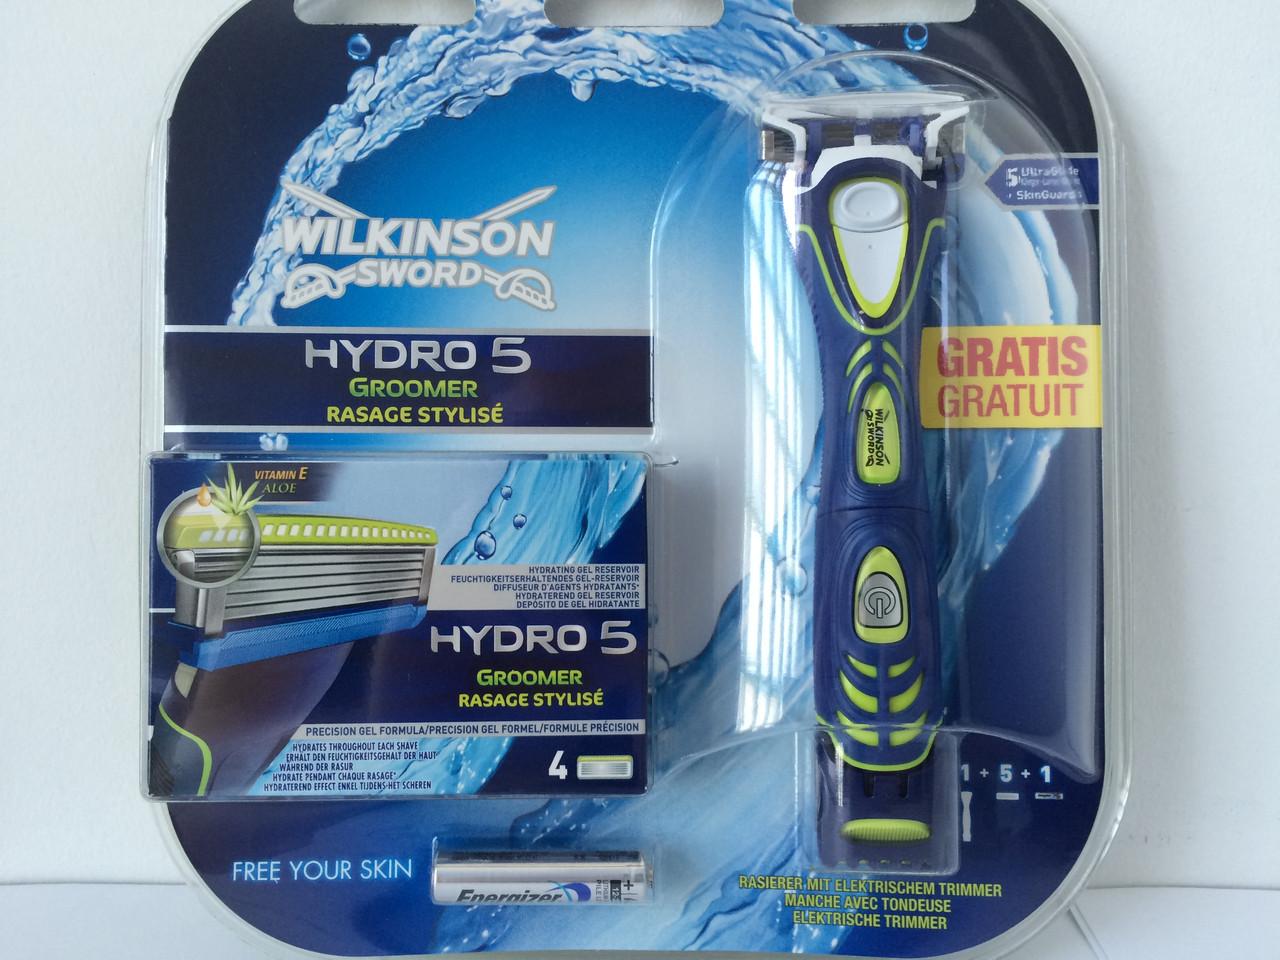 "Набор для бритья мужской Wilkinson Sword Hydro 5 Groomer (Шик Вилкинсон Грумер тример + 5 катриджей) Германия - Интернет магазин ""БЕЗФАБУЛЫ"" в Хмельницком"